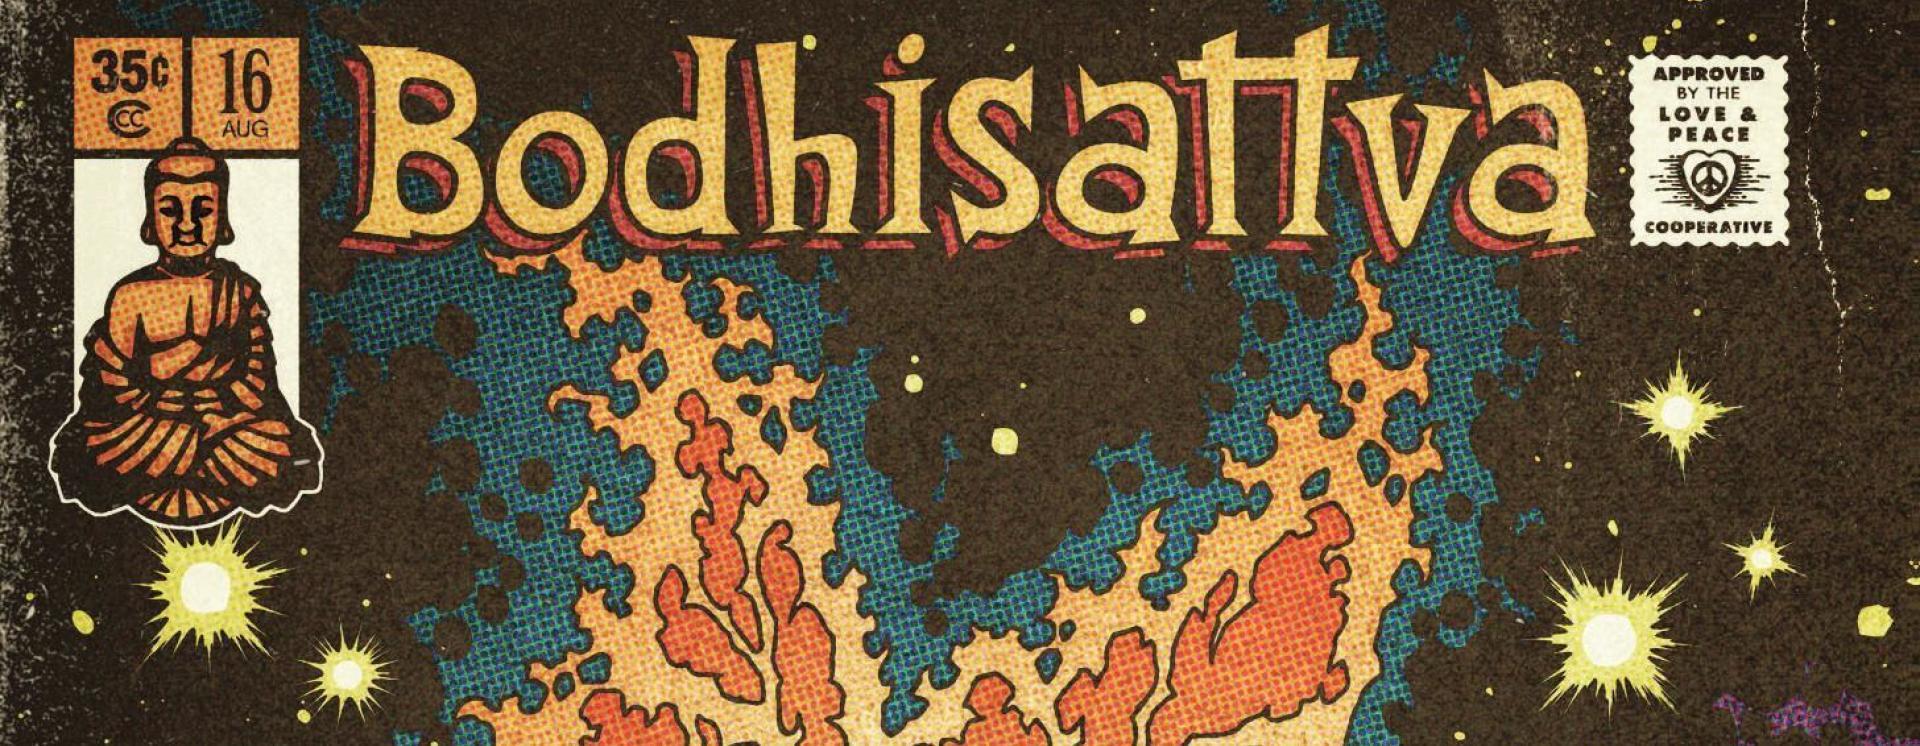 Bodhisattva   butterfly hurricane cd cover copy